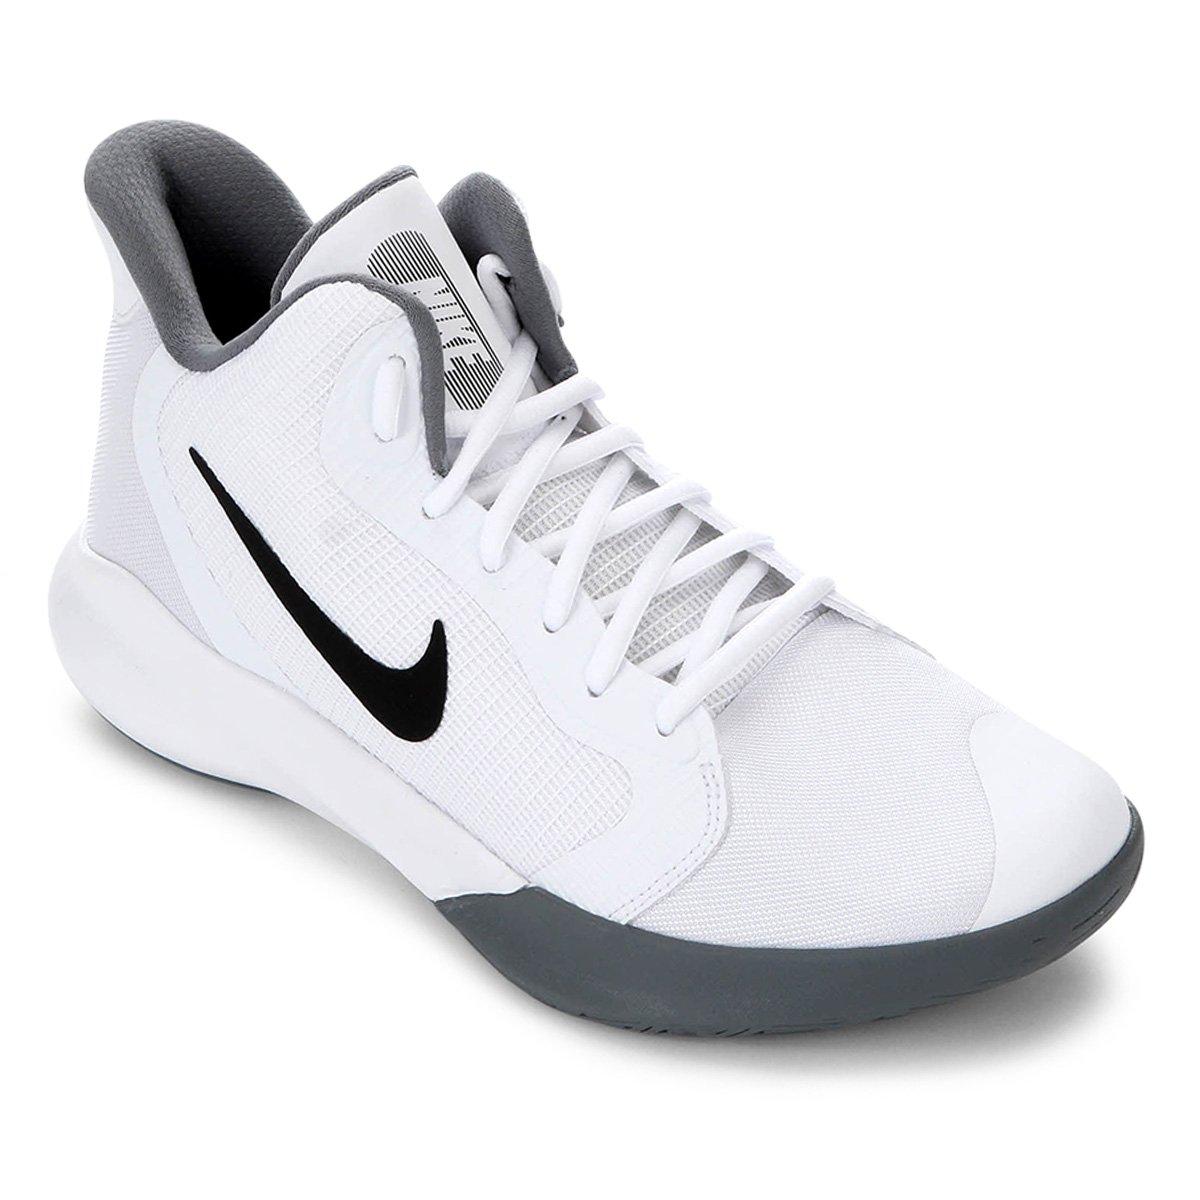 Tênis Nike Precision III Branco e Preto